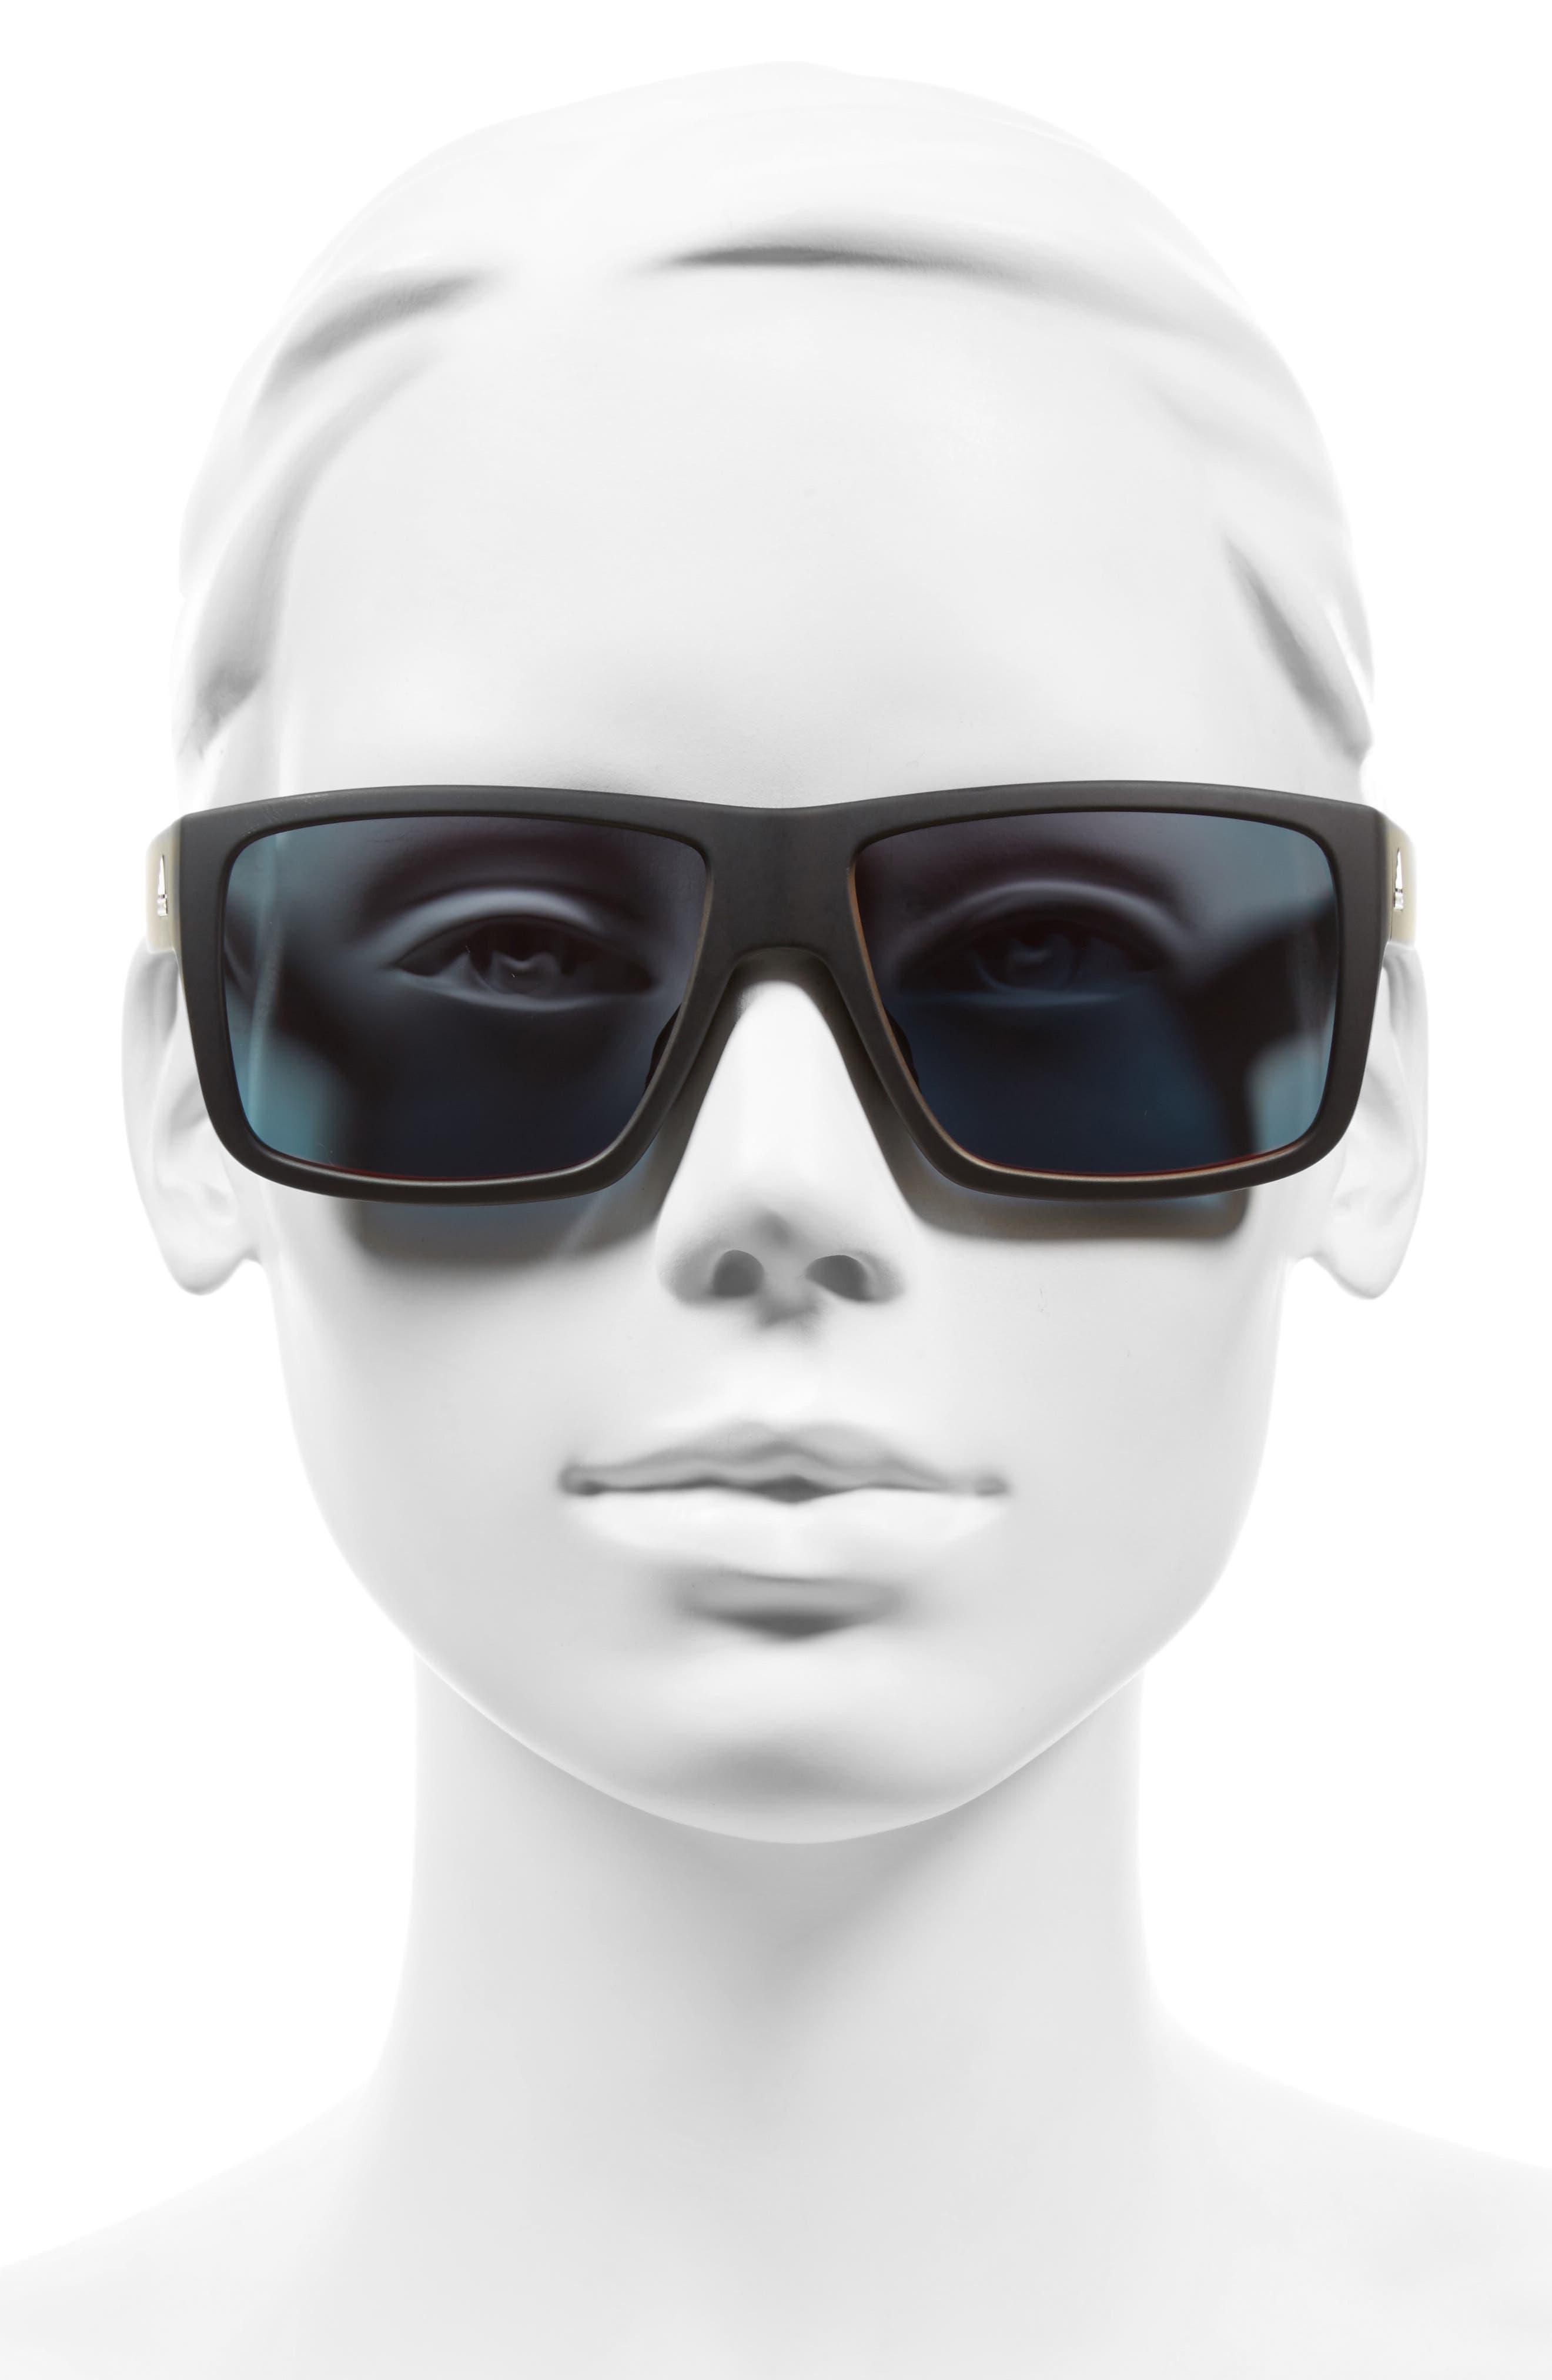 Matic 59mm Sunglasses,                             Alternate thumbnail 4, color,                             BLACK MATTE/ RED MIRROR